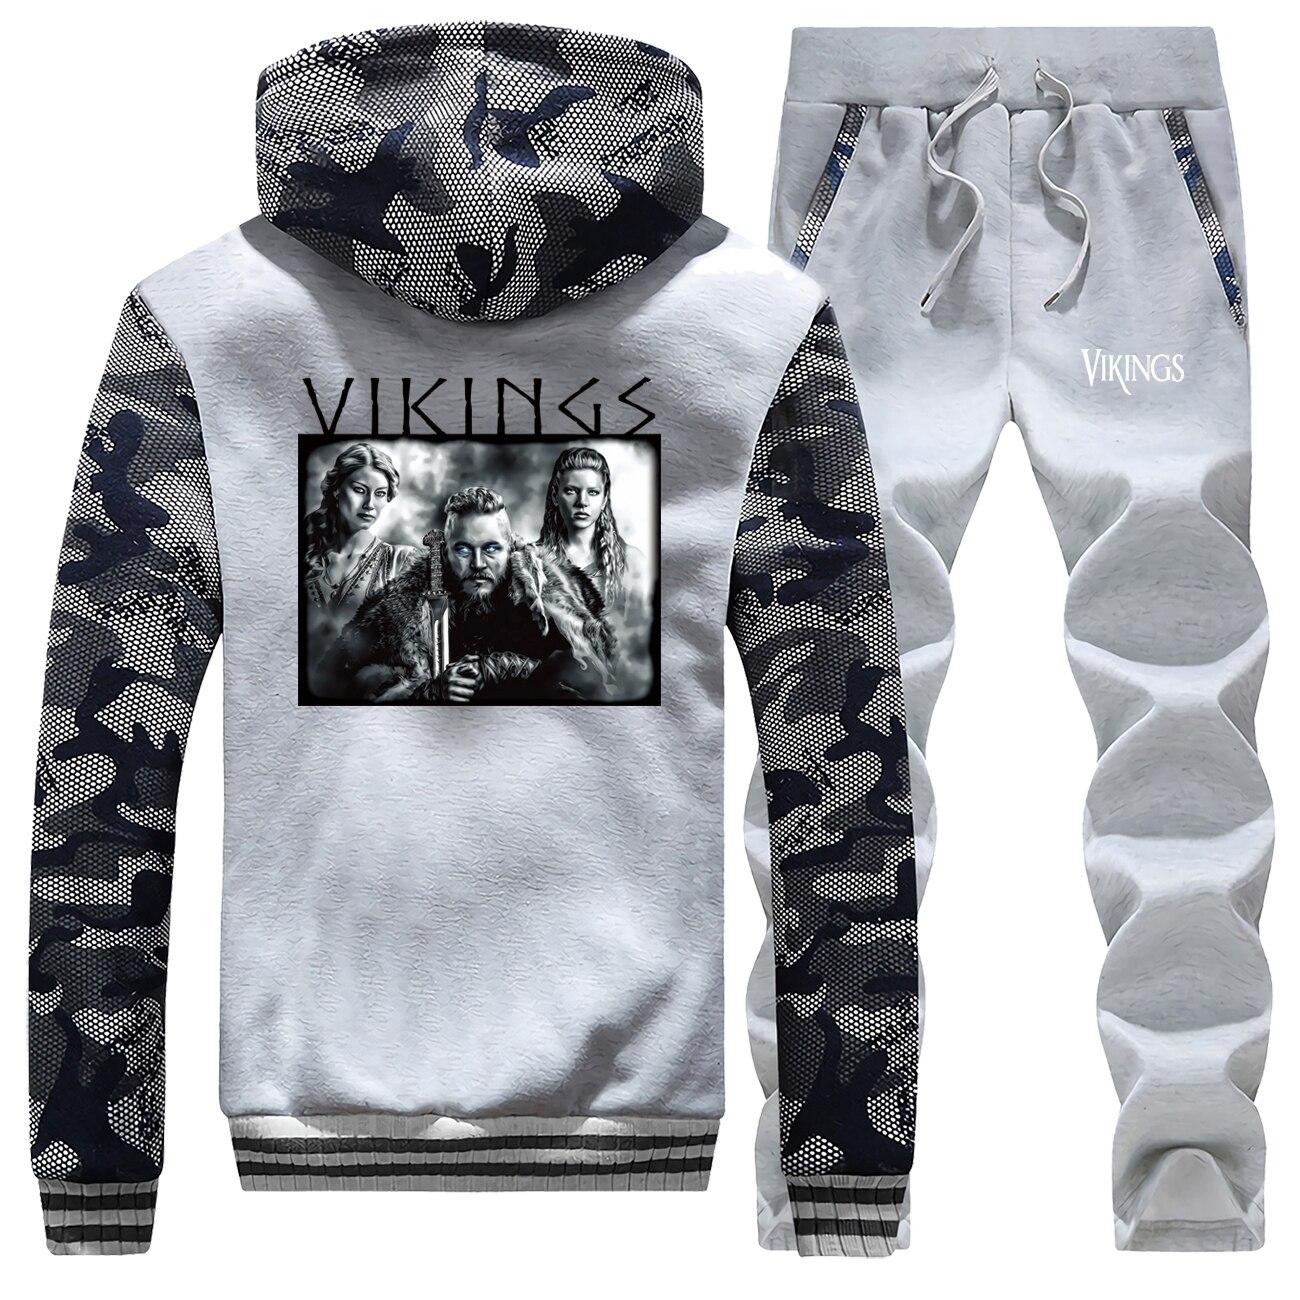 2019 New Winter Suit Hoodies Raglan Camouflage Men Sportswear Vikings Printed Coat Thick Fleece Hooded+Sweatpants 2 Piece Set